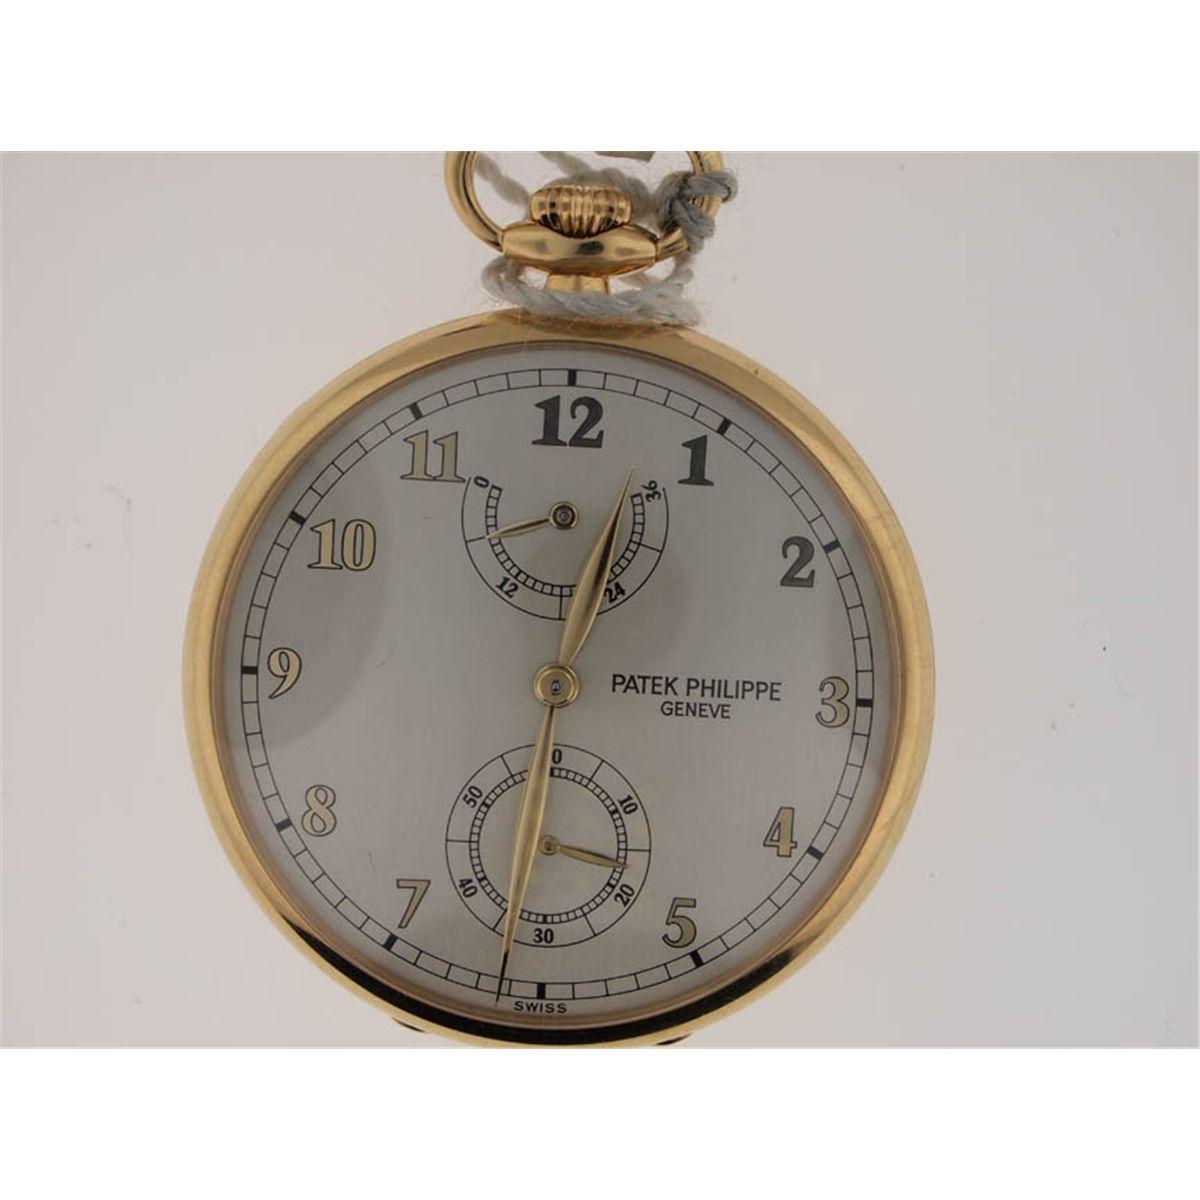 750252cec Patek Philippe 18k Gold Pocket Watch. Power Reserve. Loading zoom